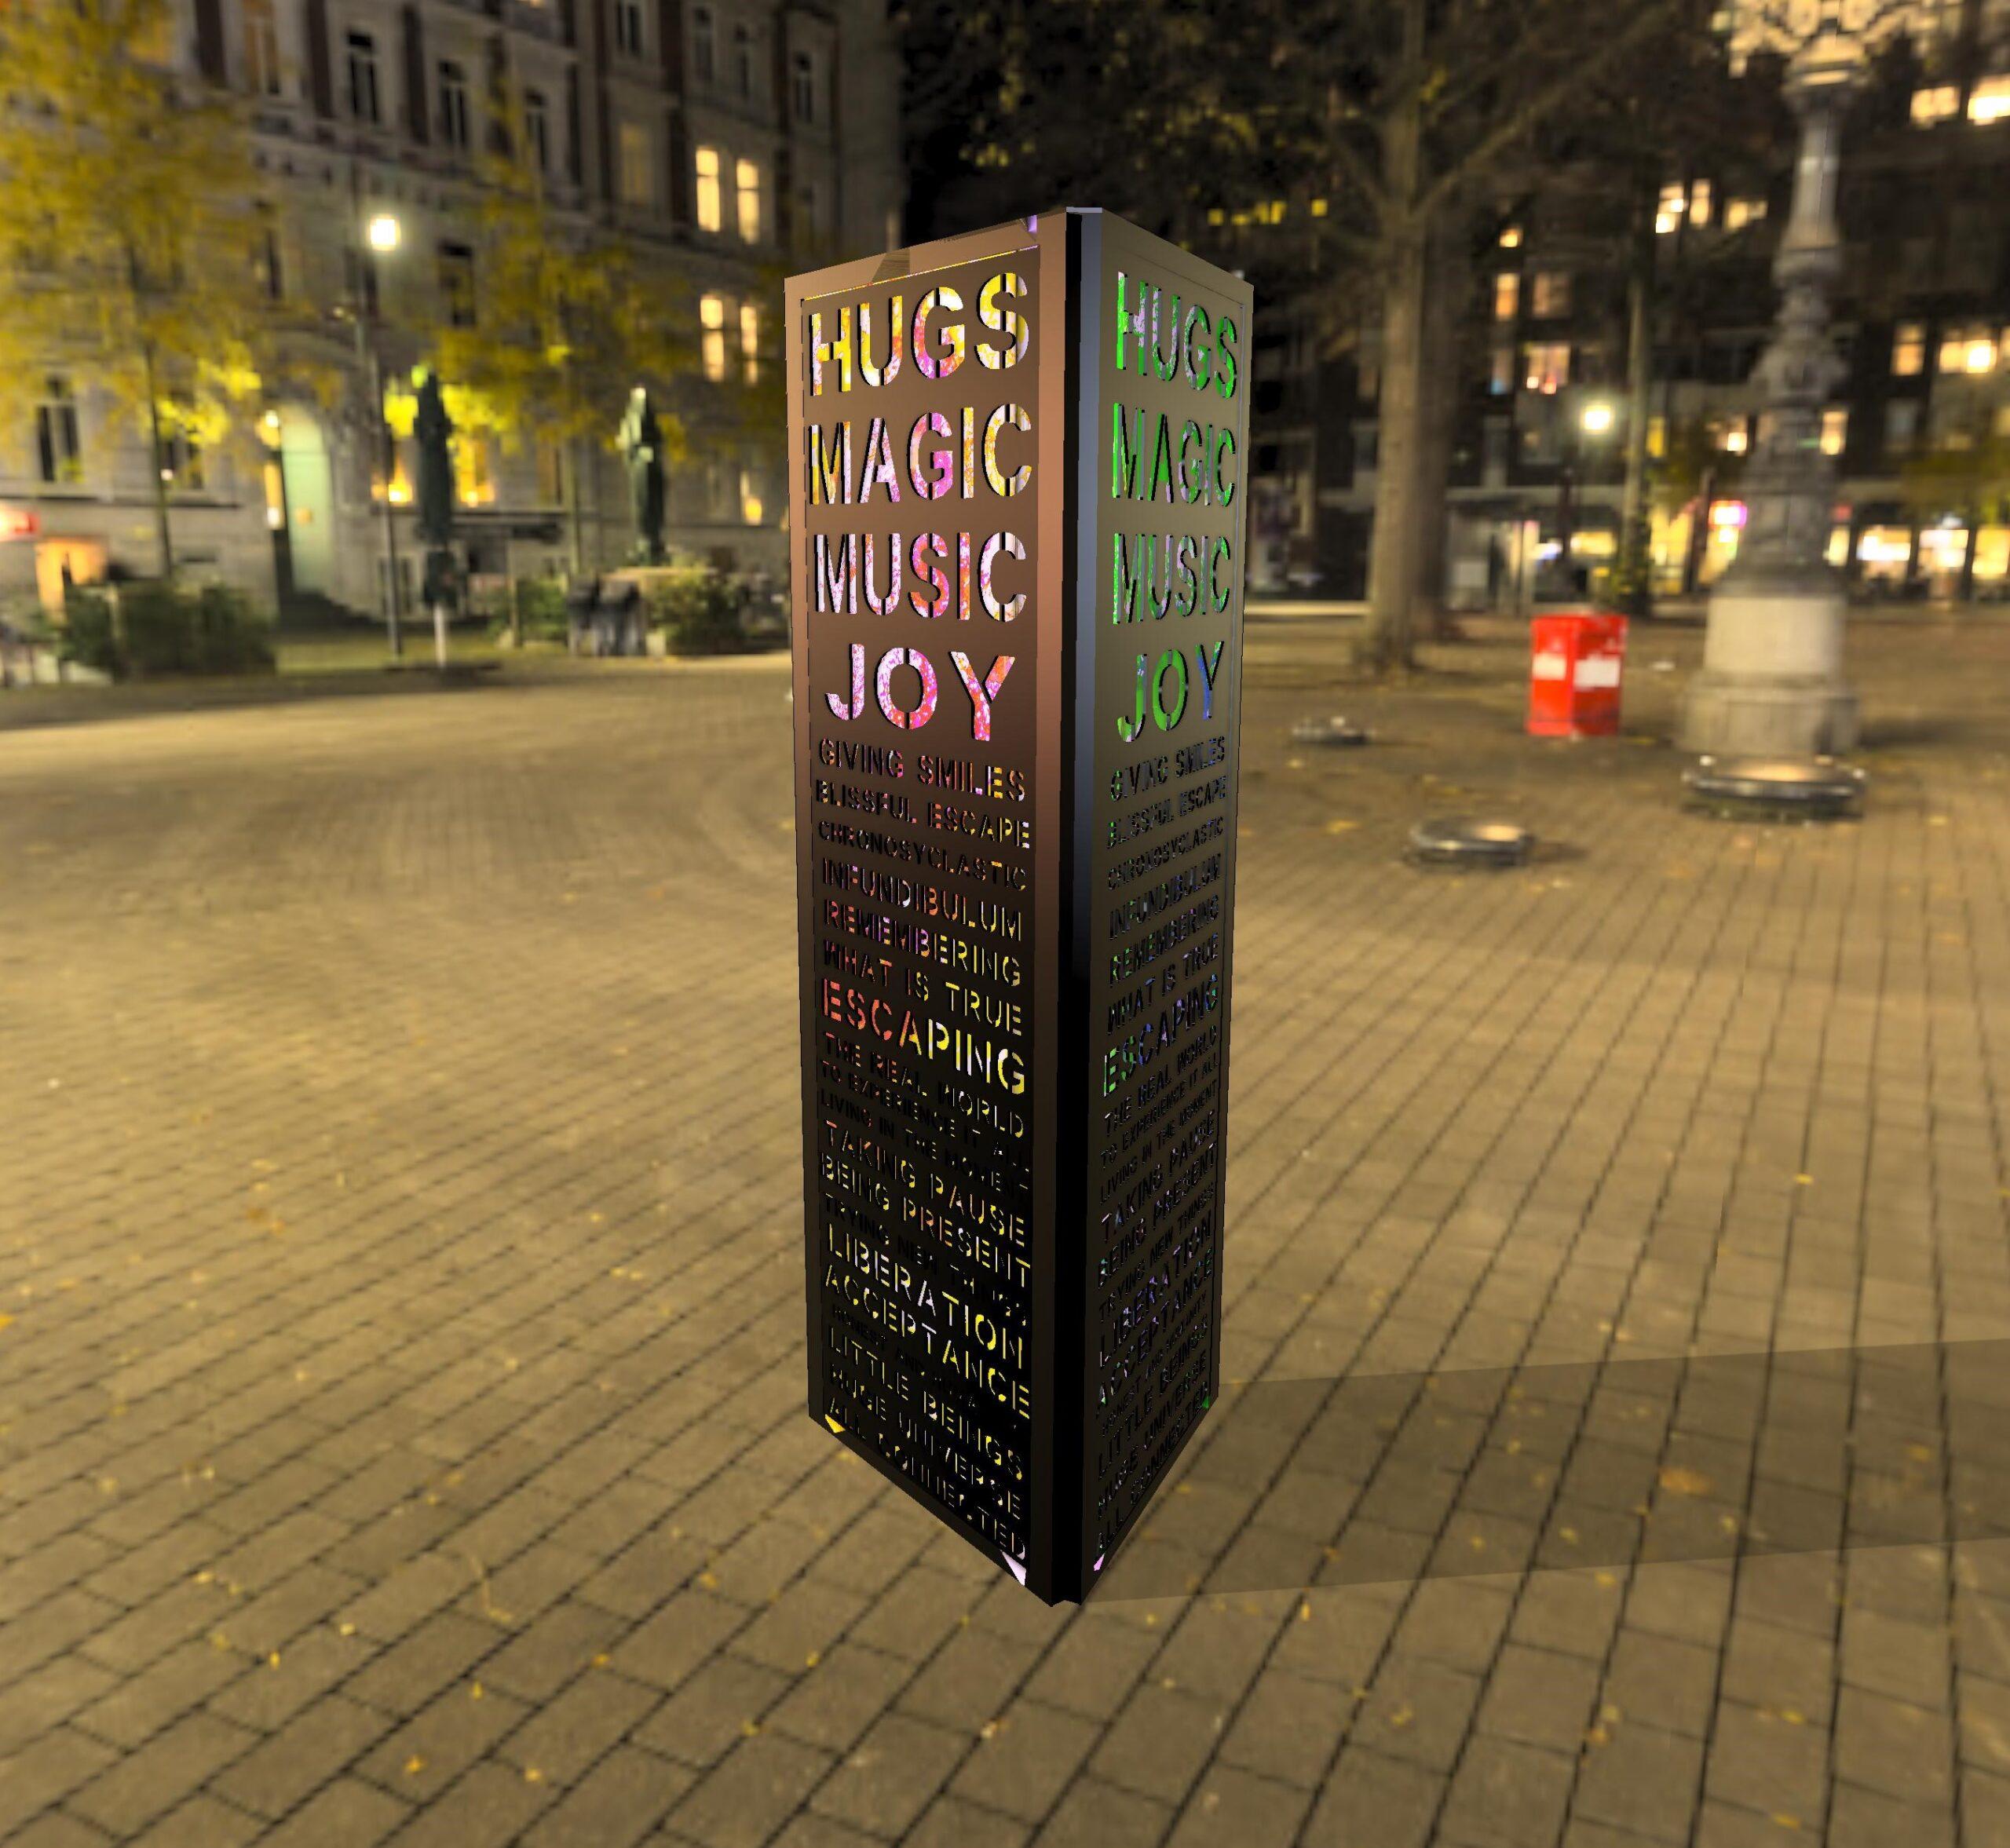 https://orloskystudio.com/wp-content/uploads/2021/10/POP-Light-Box-Prism-Pillar-3-scaled.jpg